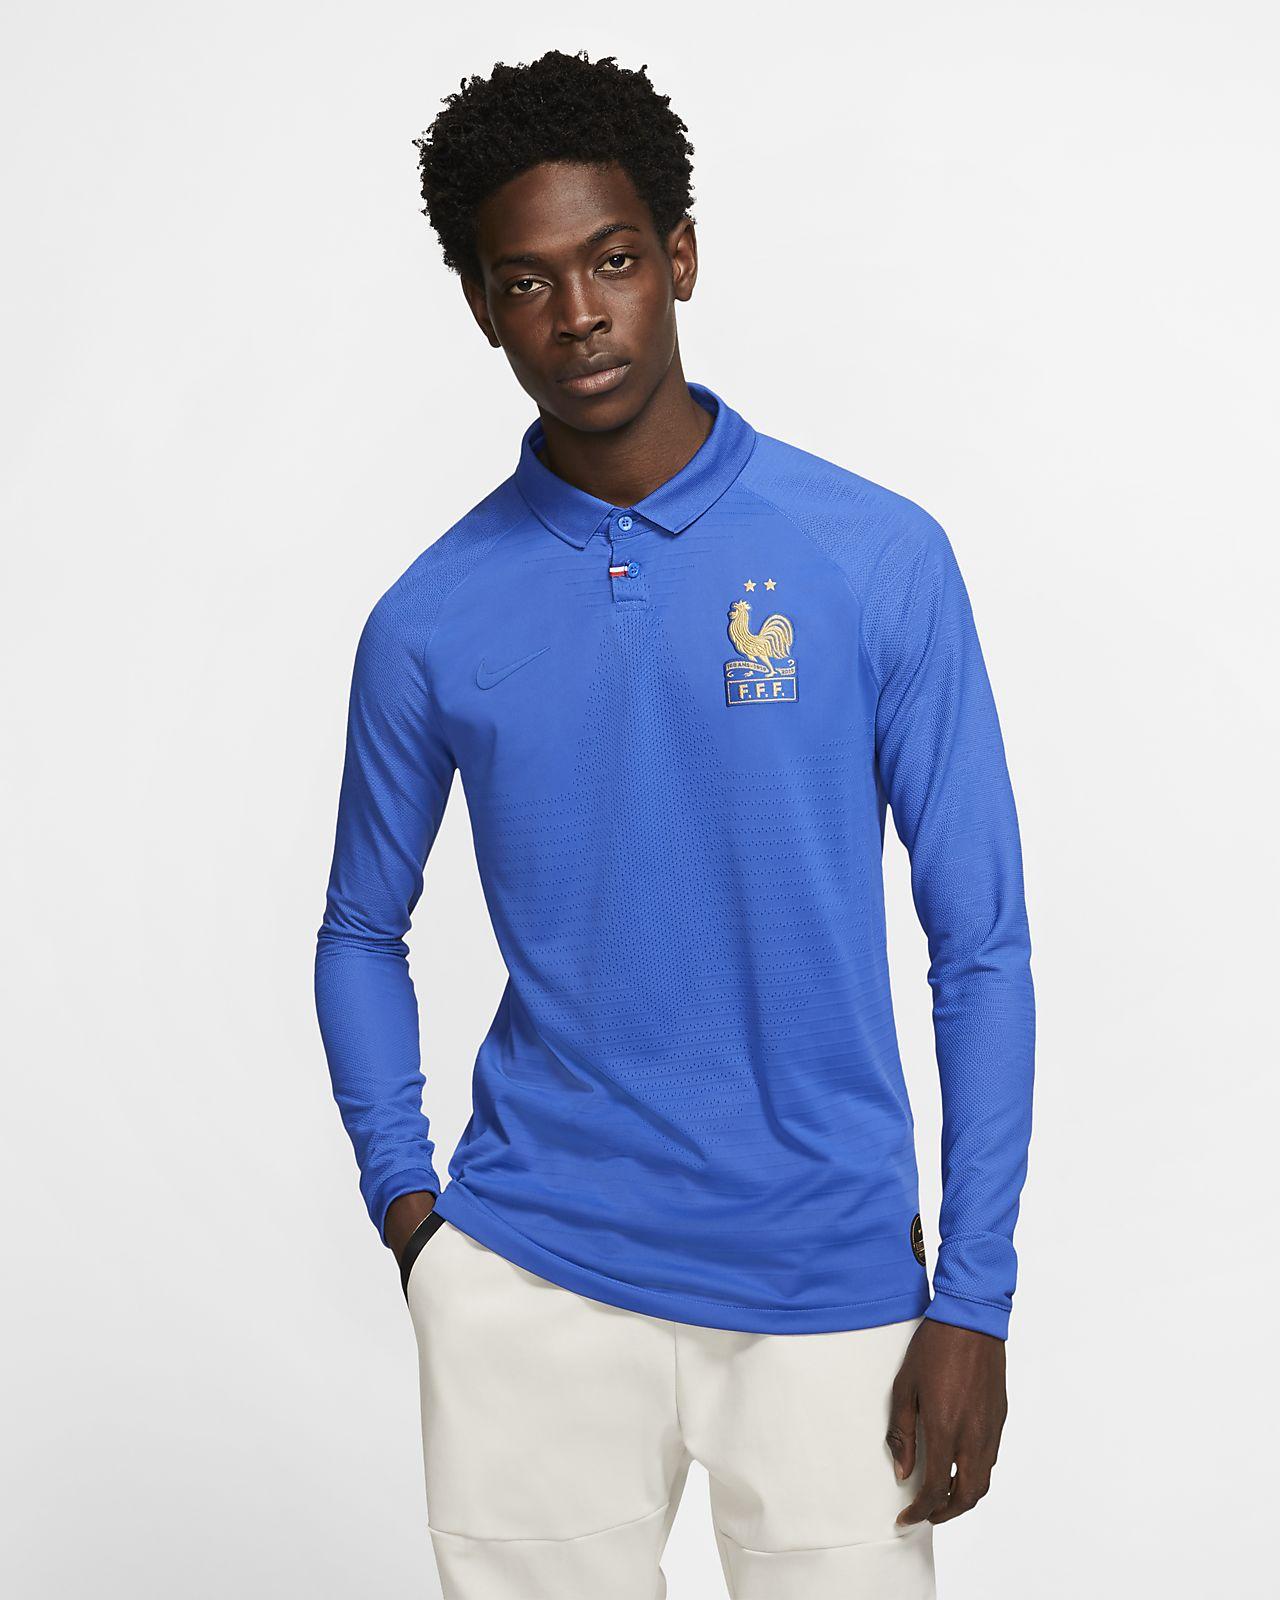 Męska koszulka z długim rękawem FFF Vapor Match Centennial